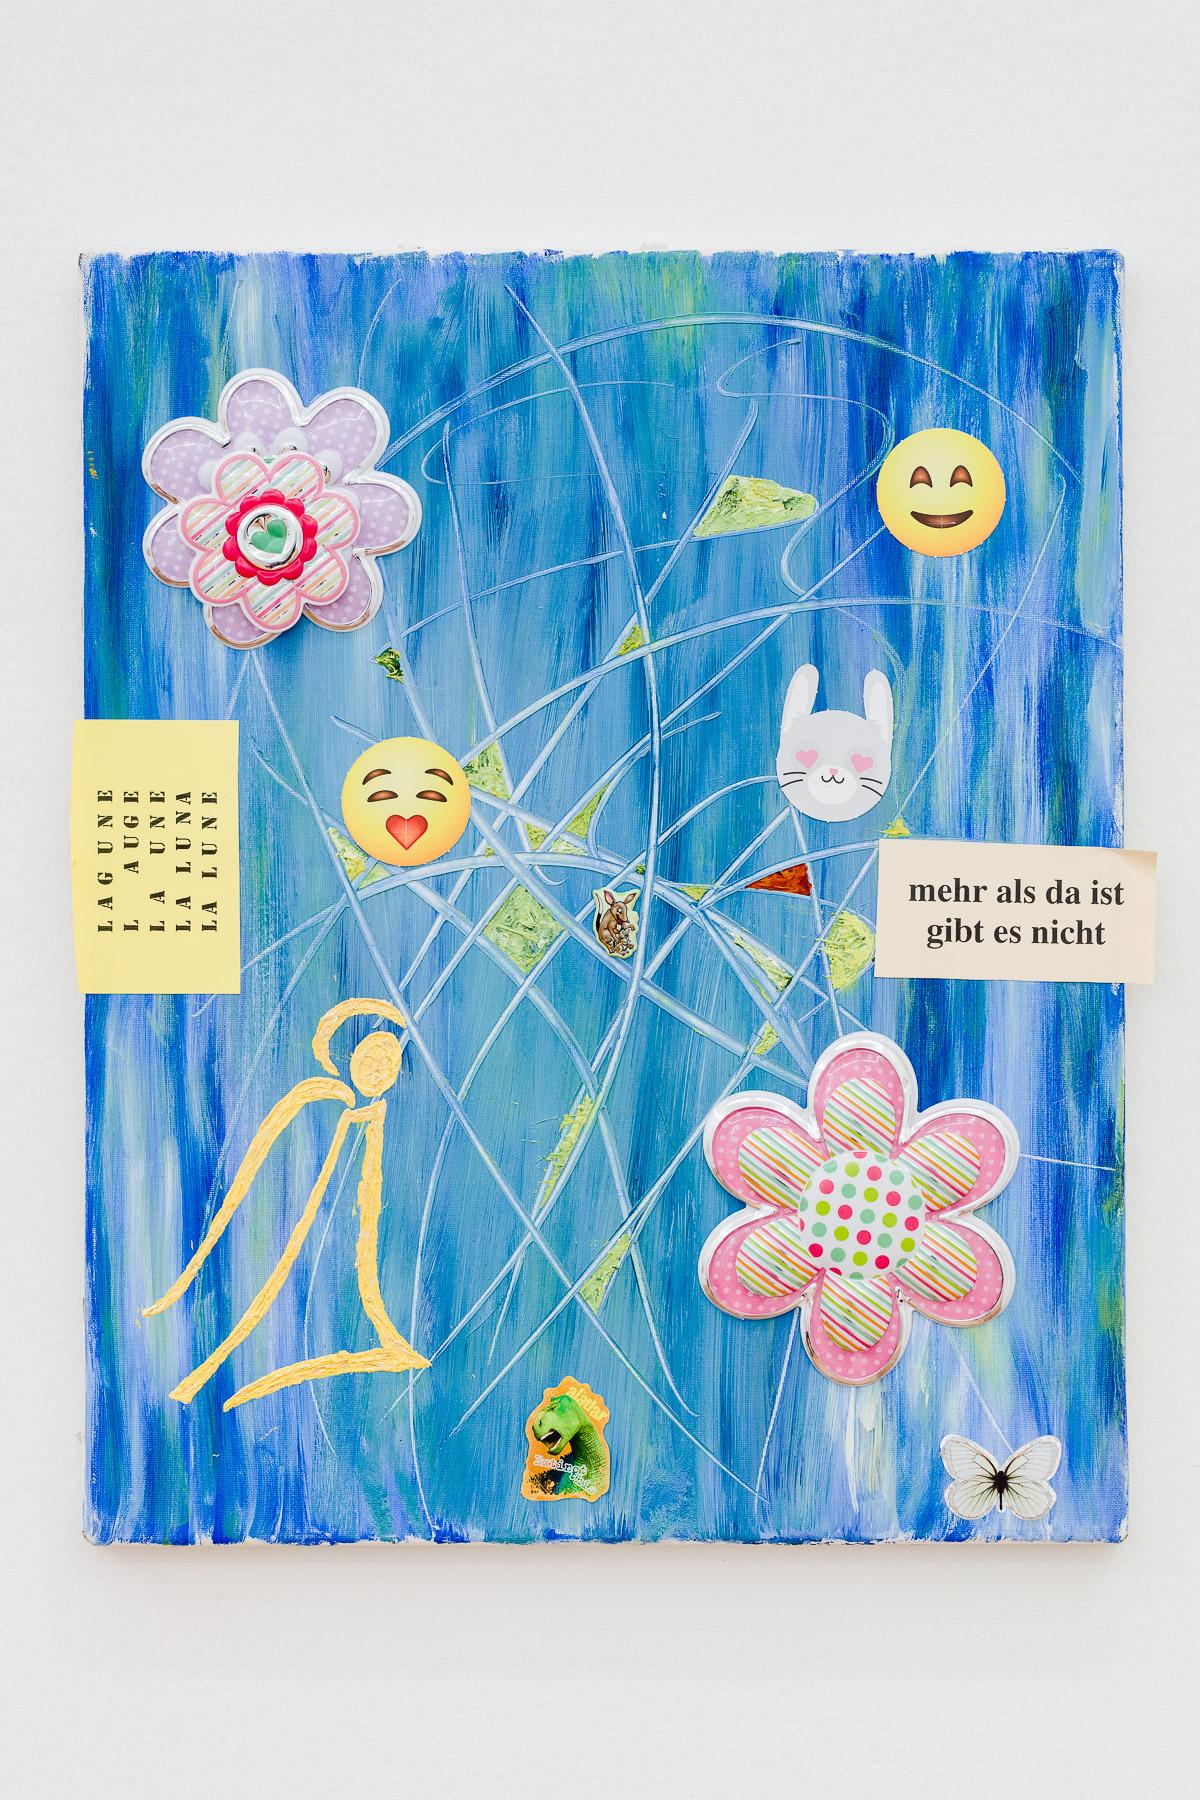 2019_05_20_Elke-Krystufek_Croy-Nielsen_by-kunst-dokumentation-com_024_web.jpg